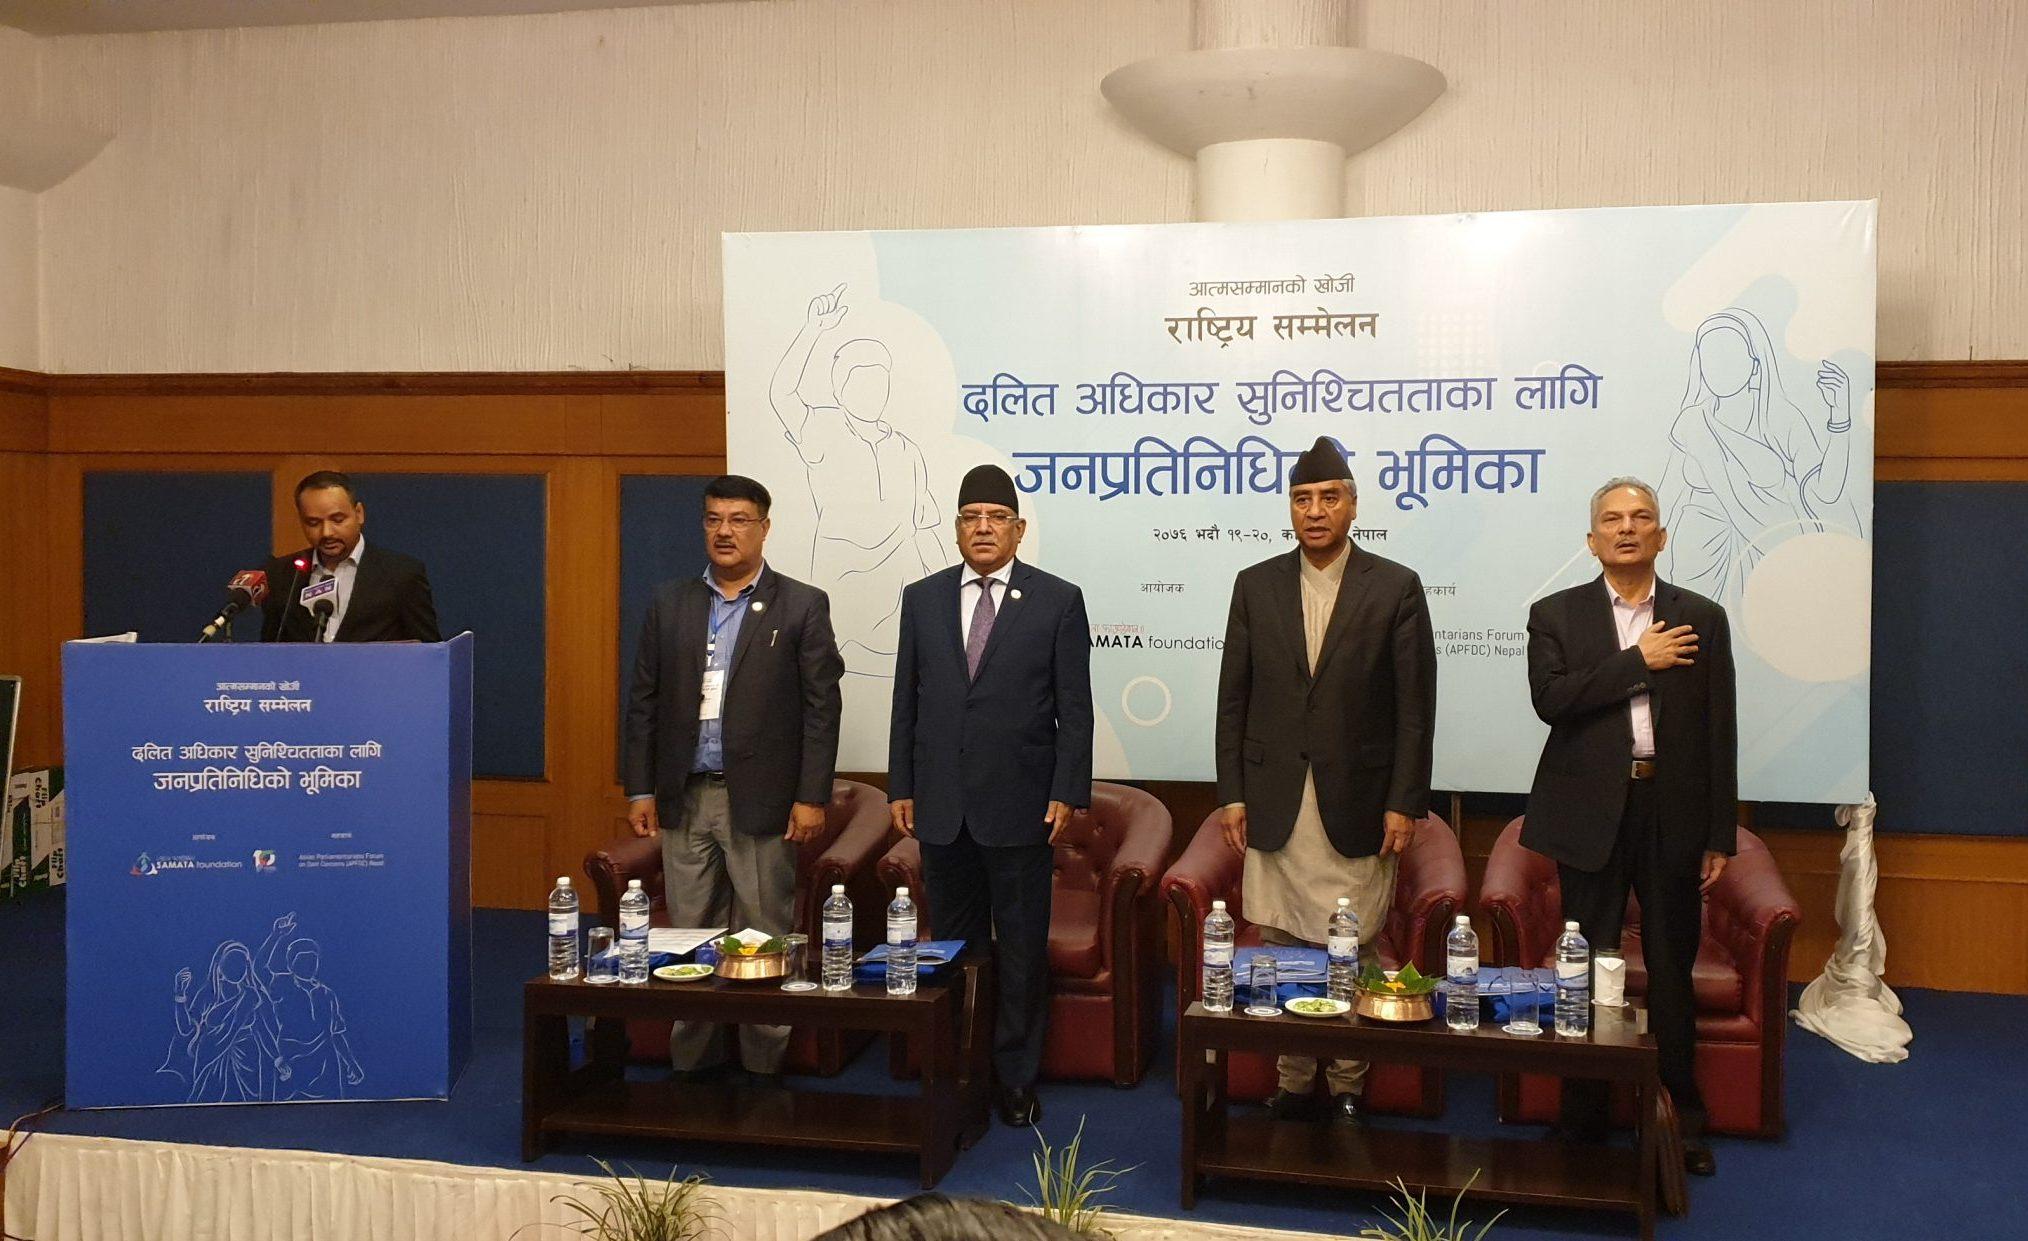 Dalit in Nepal Representation Role